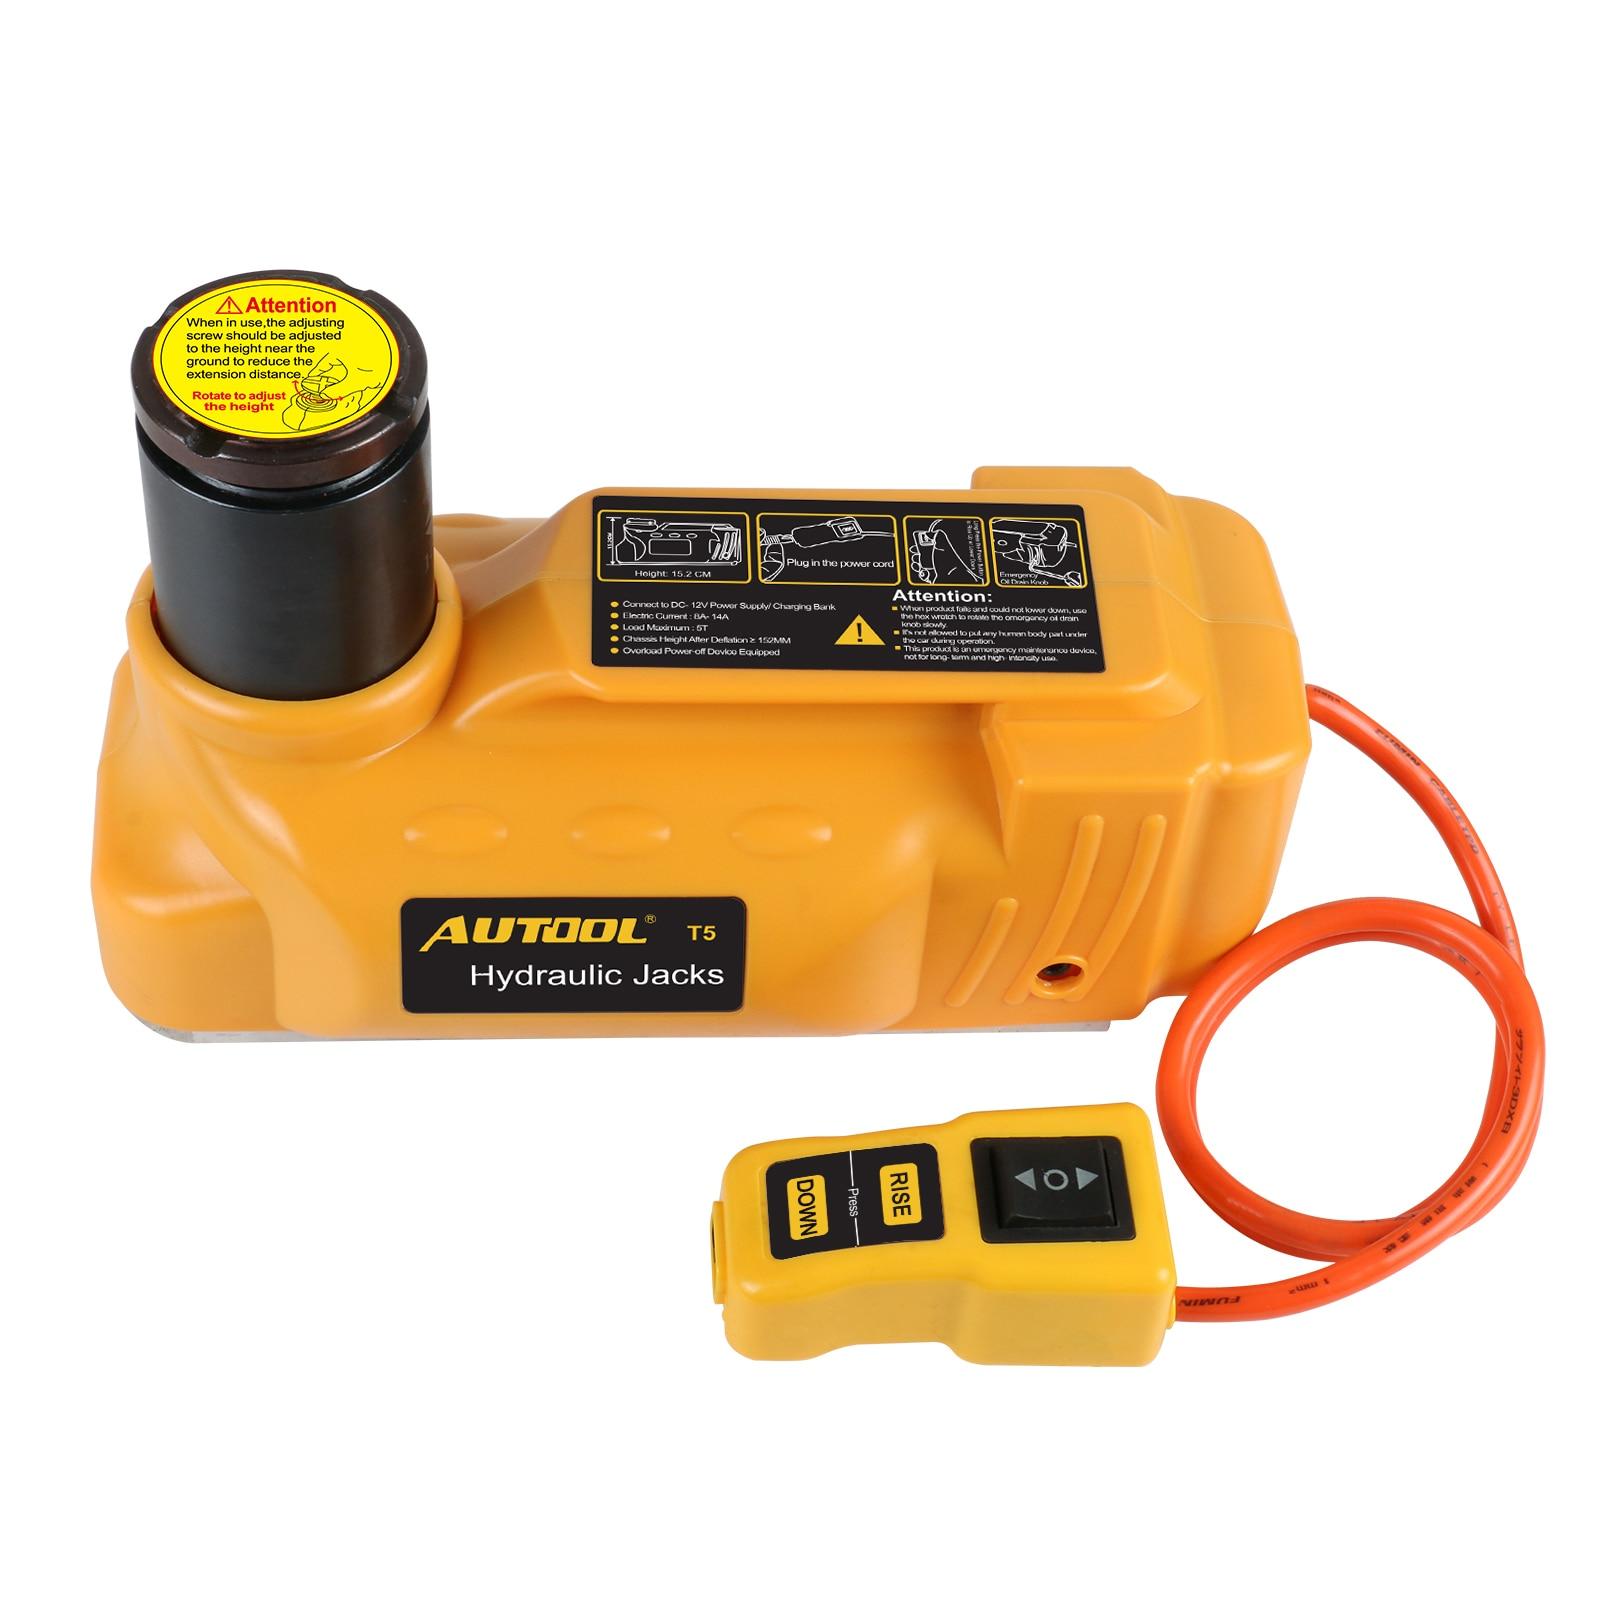 AUTOOL 3Ton 12V Hydraulic Car electric Jacks Tool For Automotive floor stripping